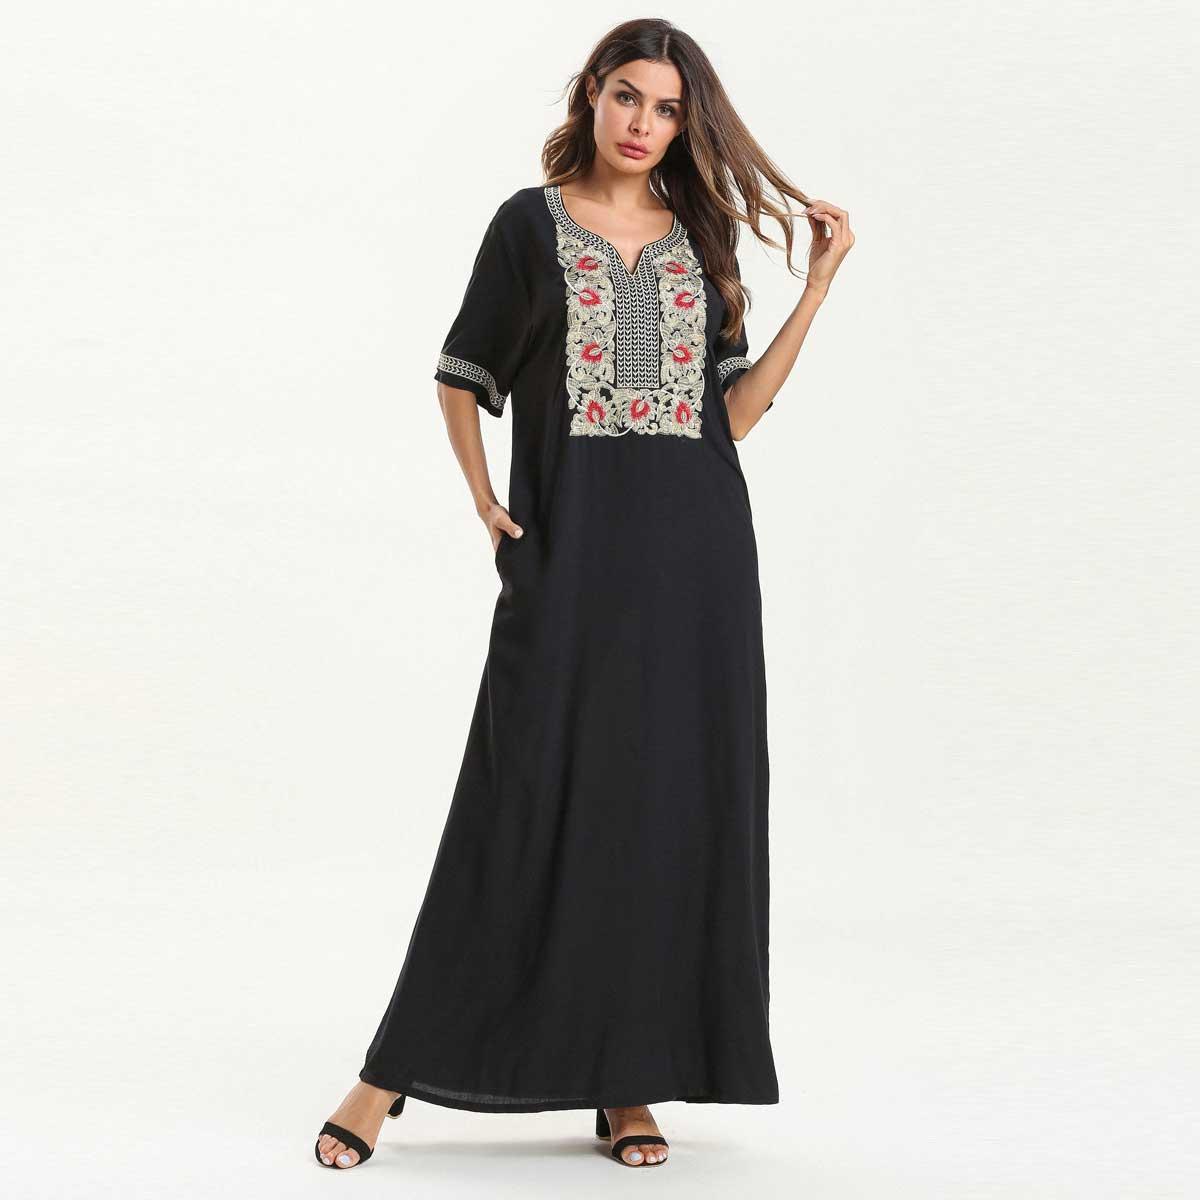 d8f79a627fc08 2019 Summer Embroidery Bohemian Maxi Dress Short Sleeve Black Muslim Abaya  Dubai Islamic UAE Arabic Cotton Robe VKDR1559